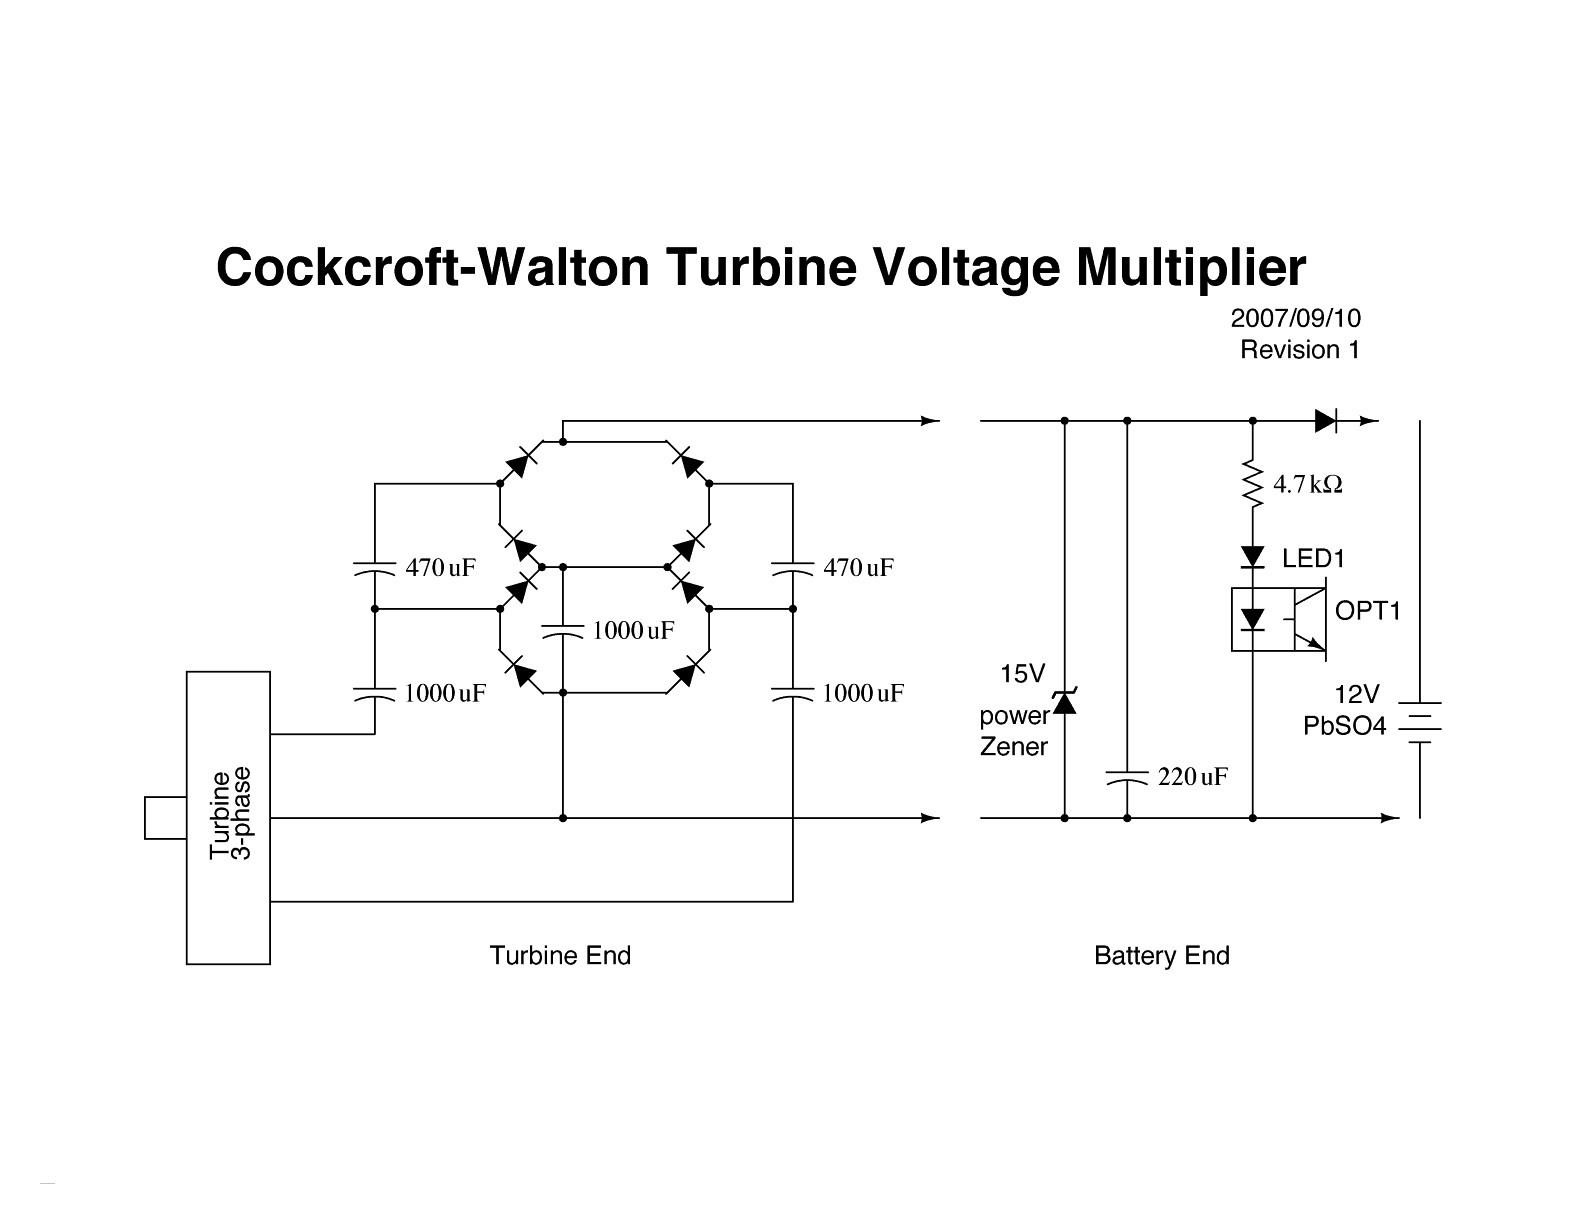 Simple Wiring Schematic For Wind Turbine Description Labview Block Diagramjpg Diagram Download Series Circuit Ponents 1584x1224